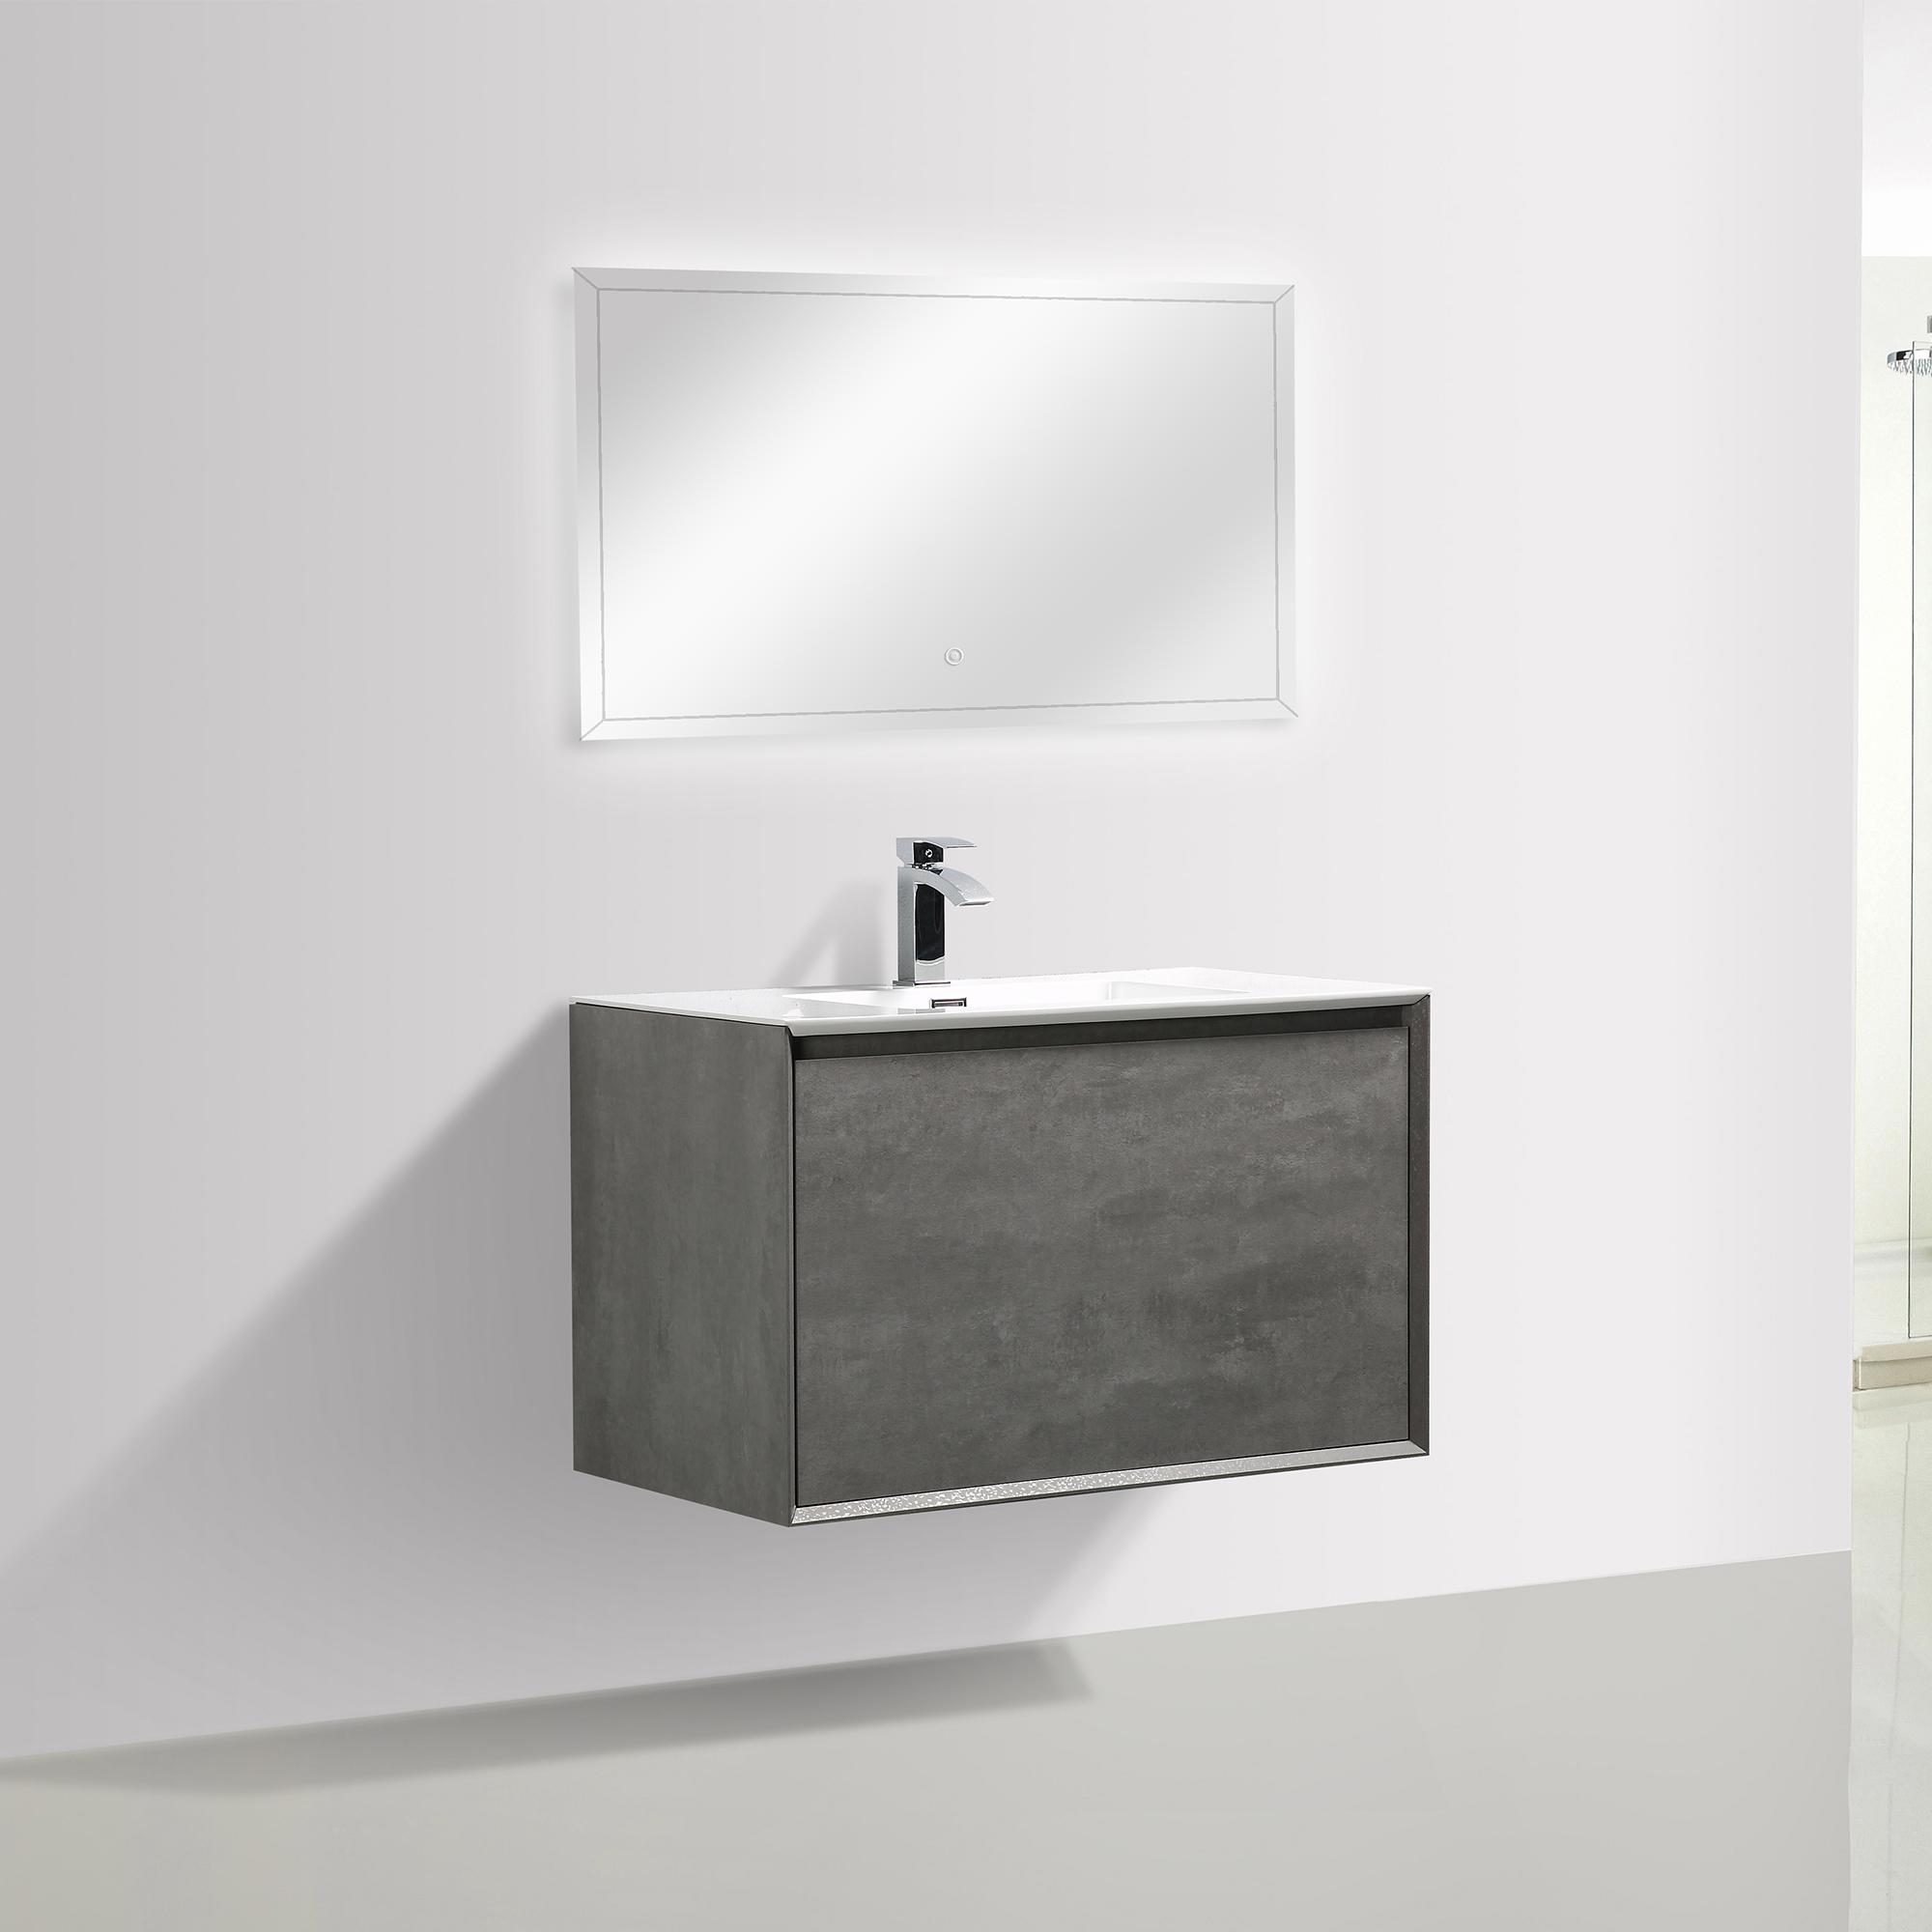 Badmöbel-Set Freya 900 Beton-Optik mit LED Beleuchtung – Optional mit Spiegel